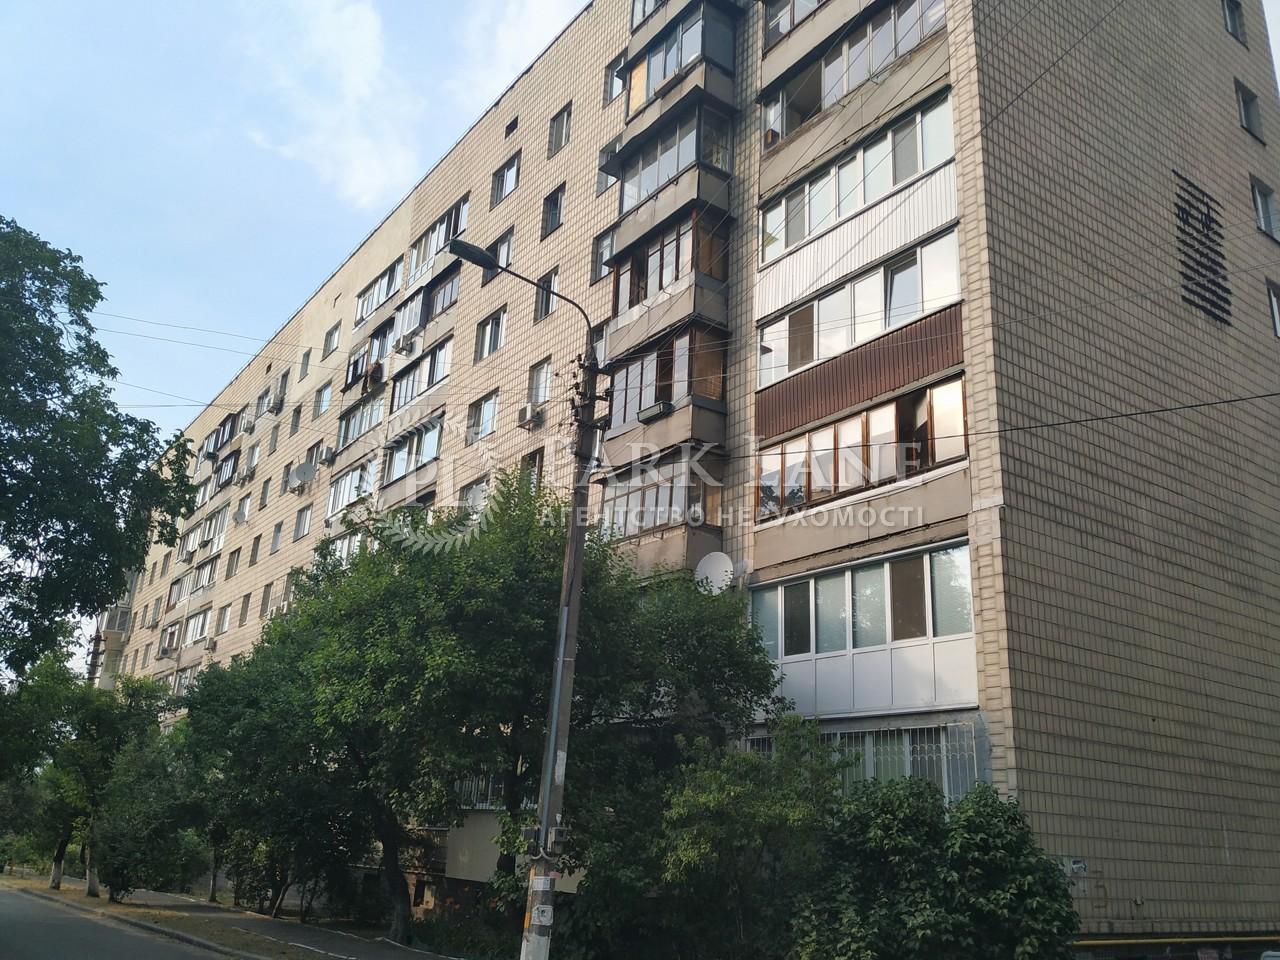 Квартира ул. Малокитаевская, 3, Киев, Z-944125 - Фото 16